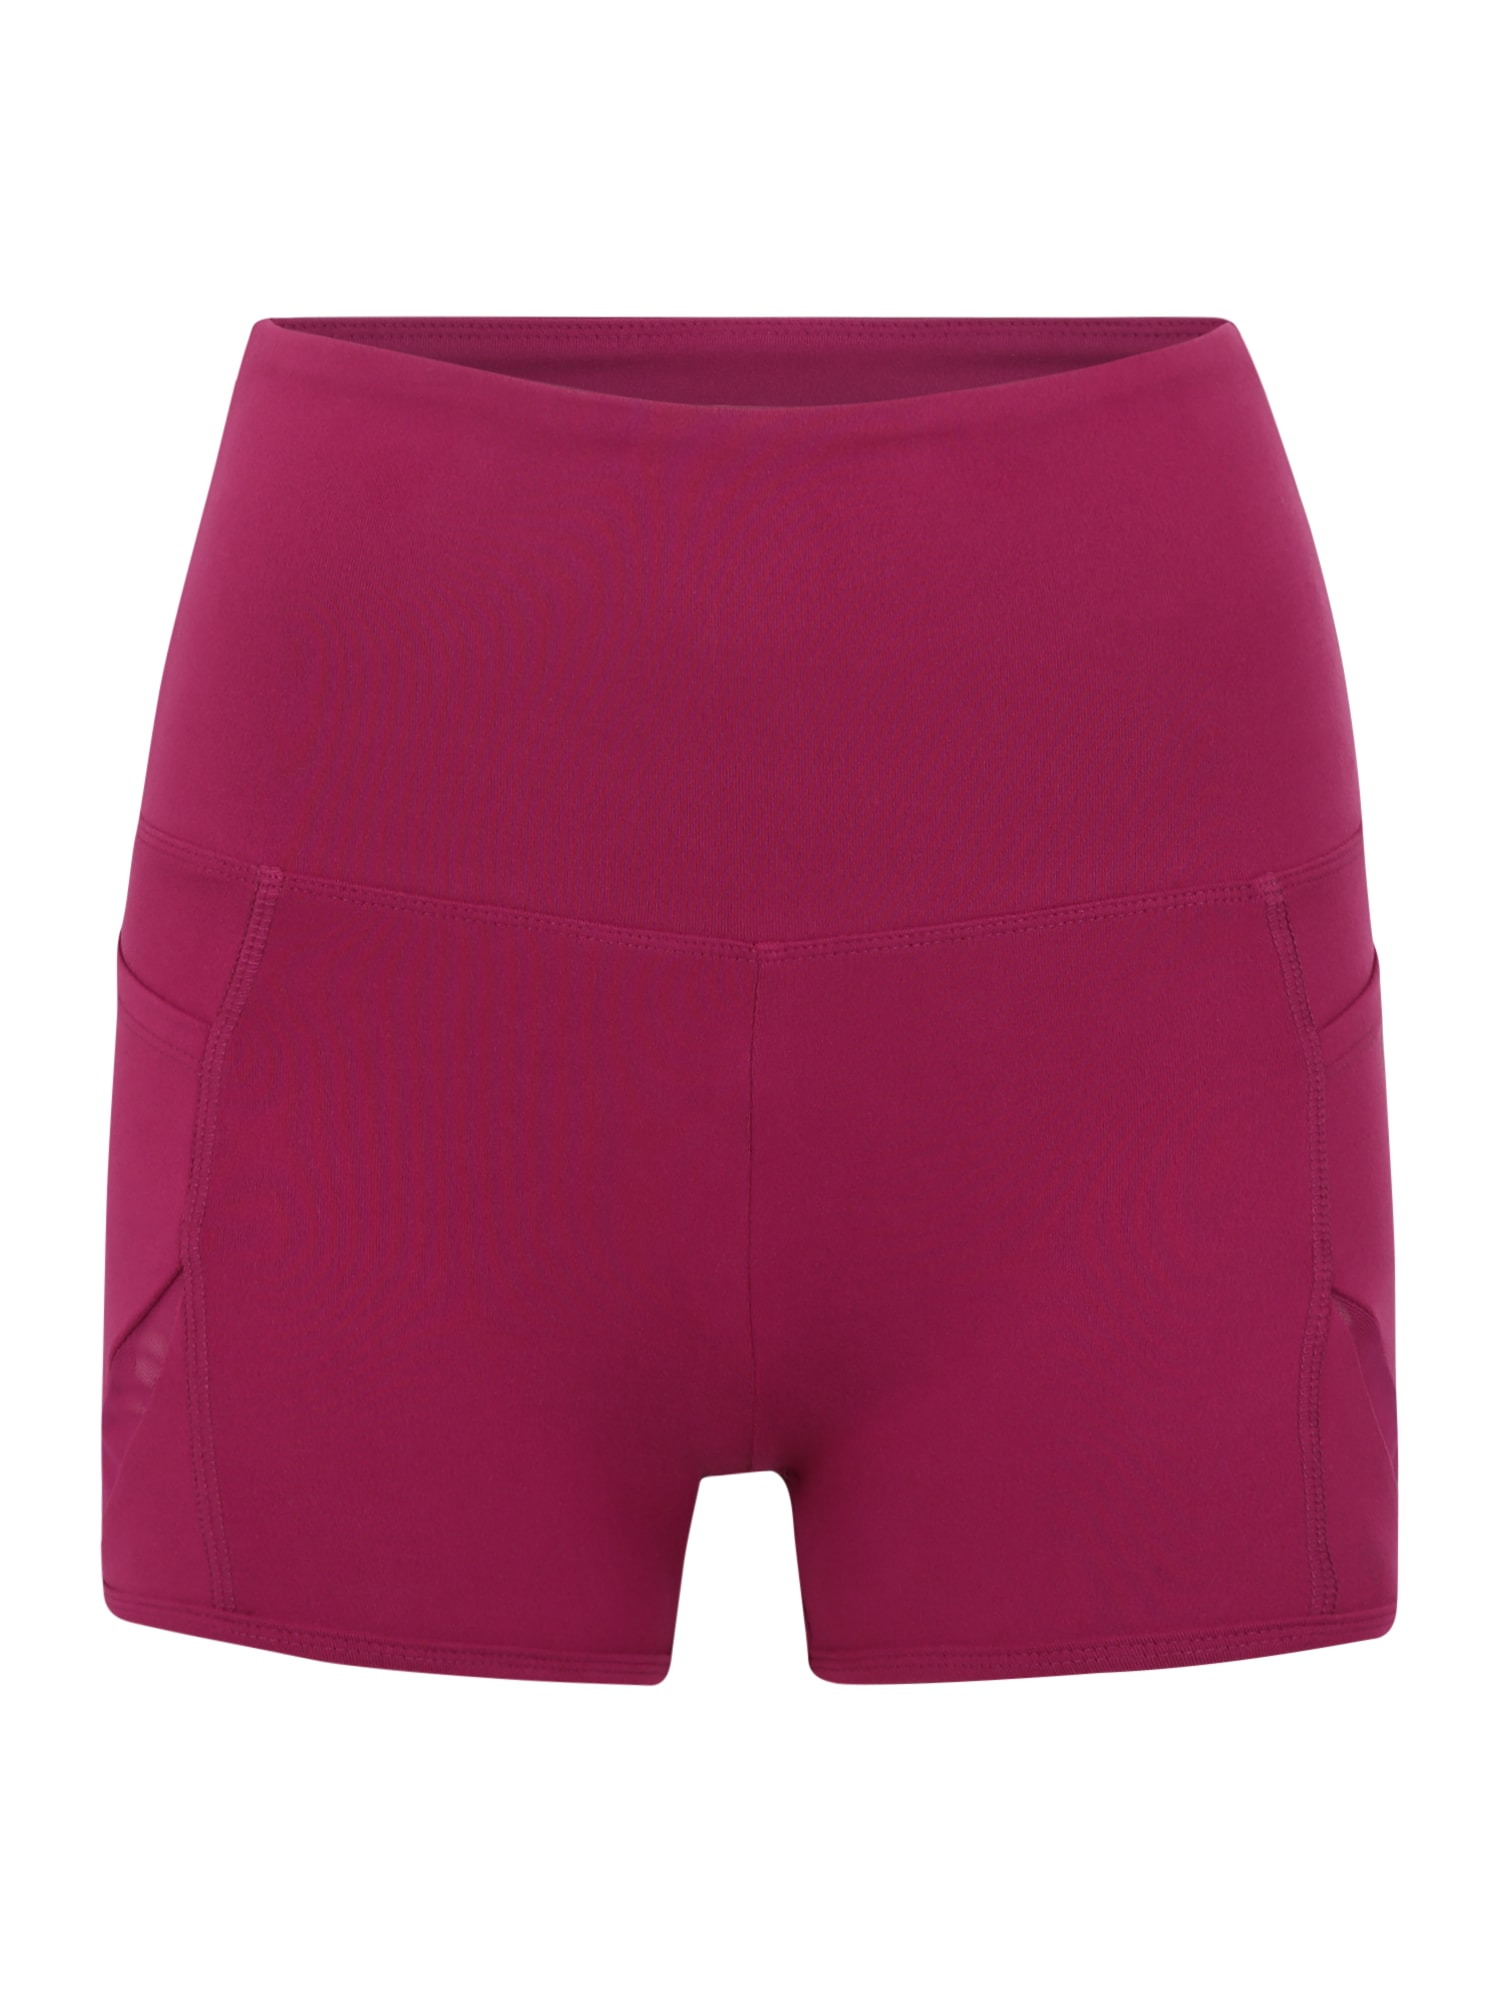 Kalhoty JASMINE HOTTIE pink Marika